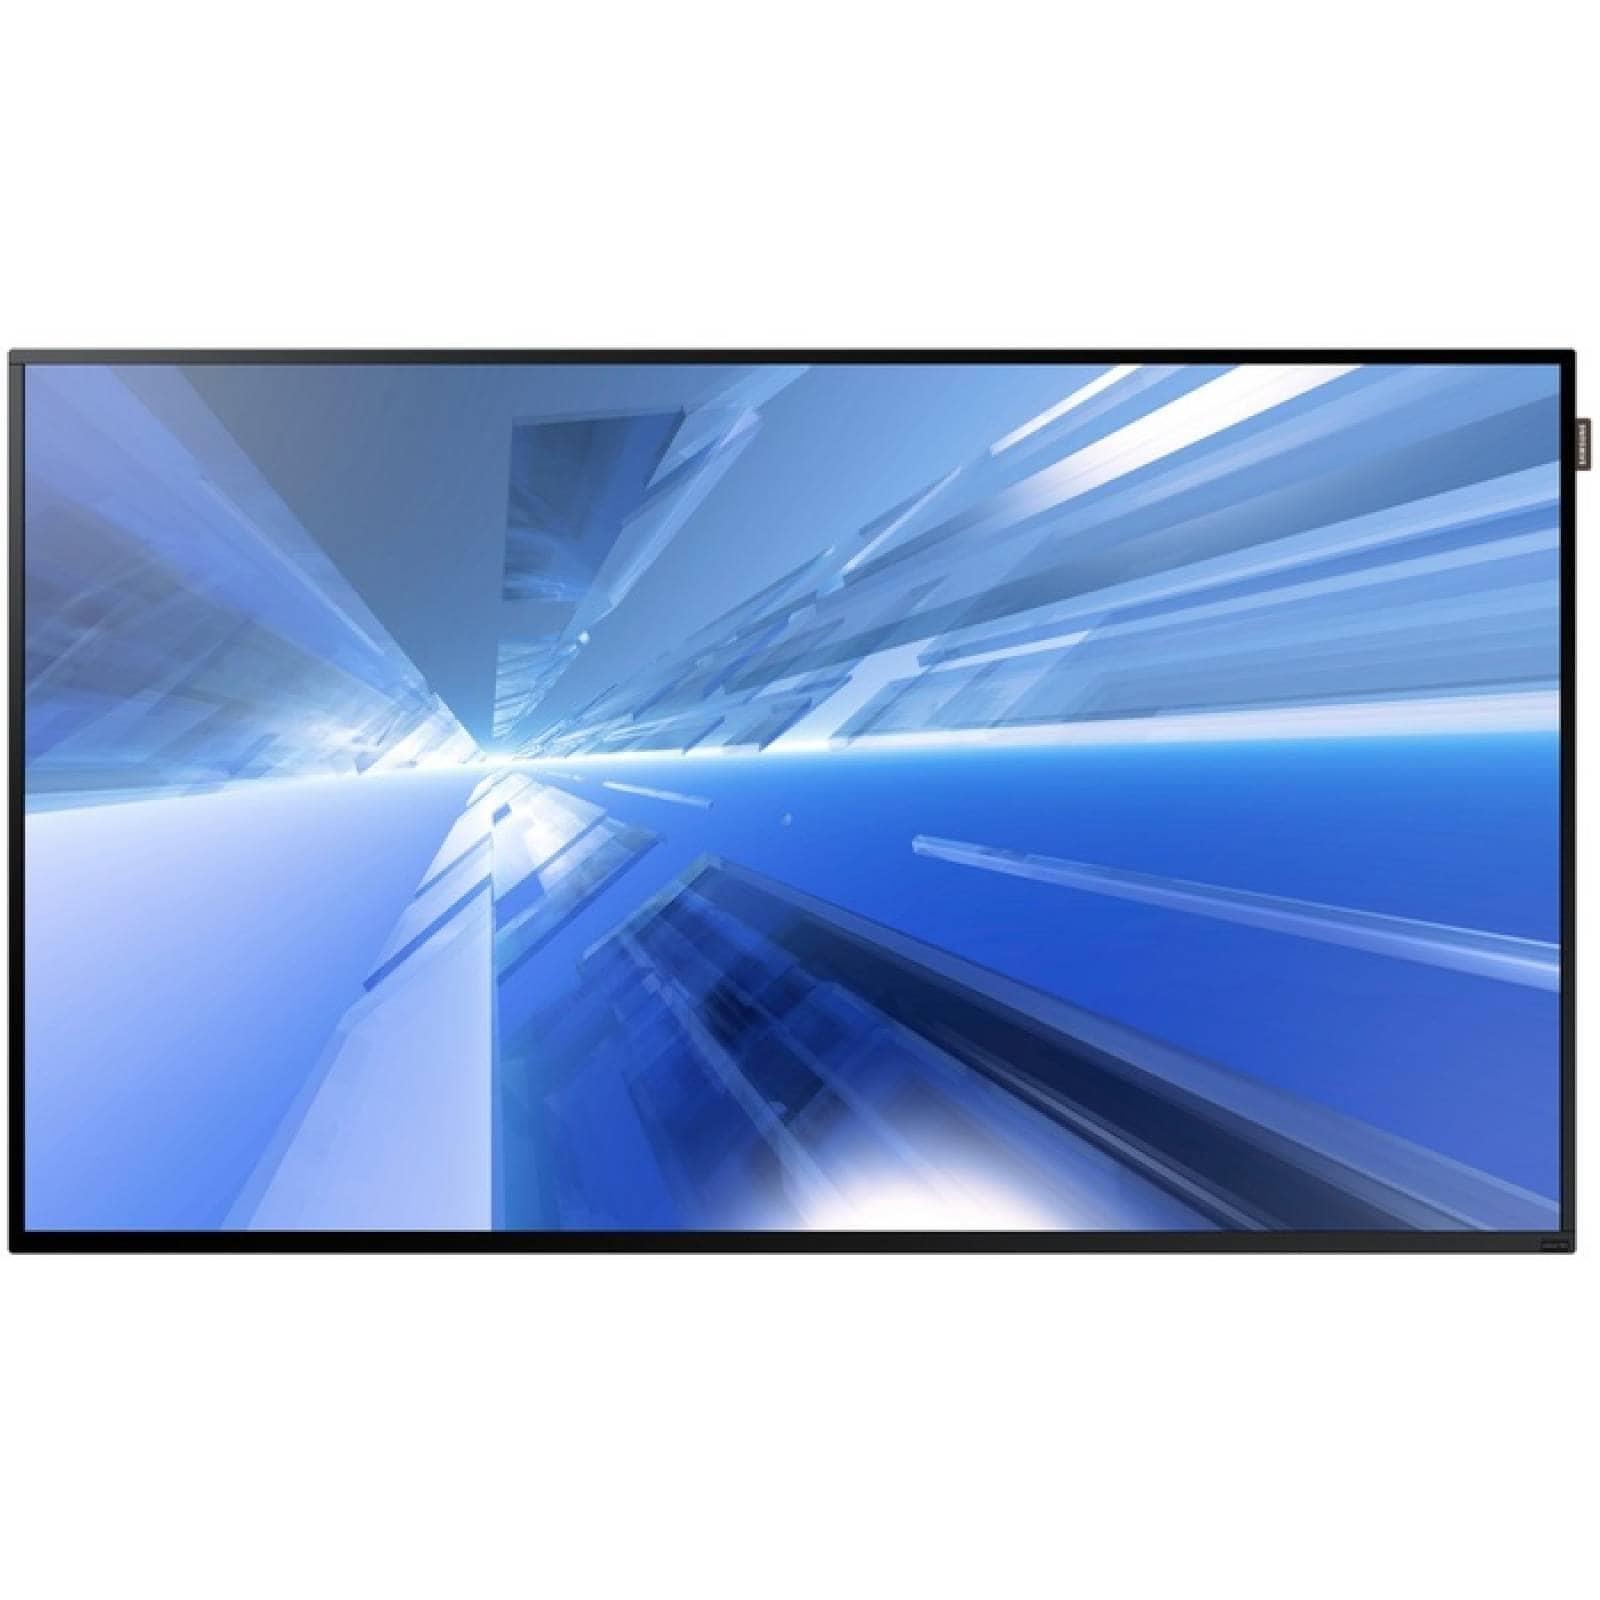 Samsung DM55E  Pantalla LED de iluminacin directa delgada de 55 quotde la serie DME